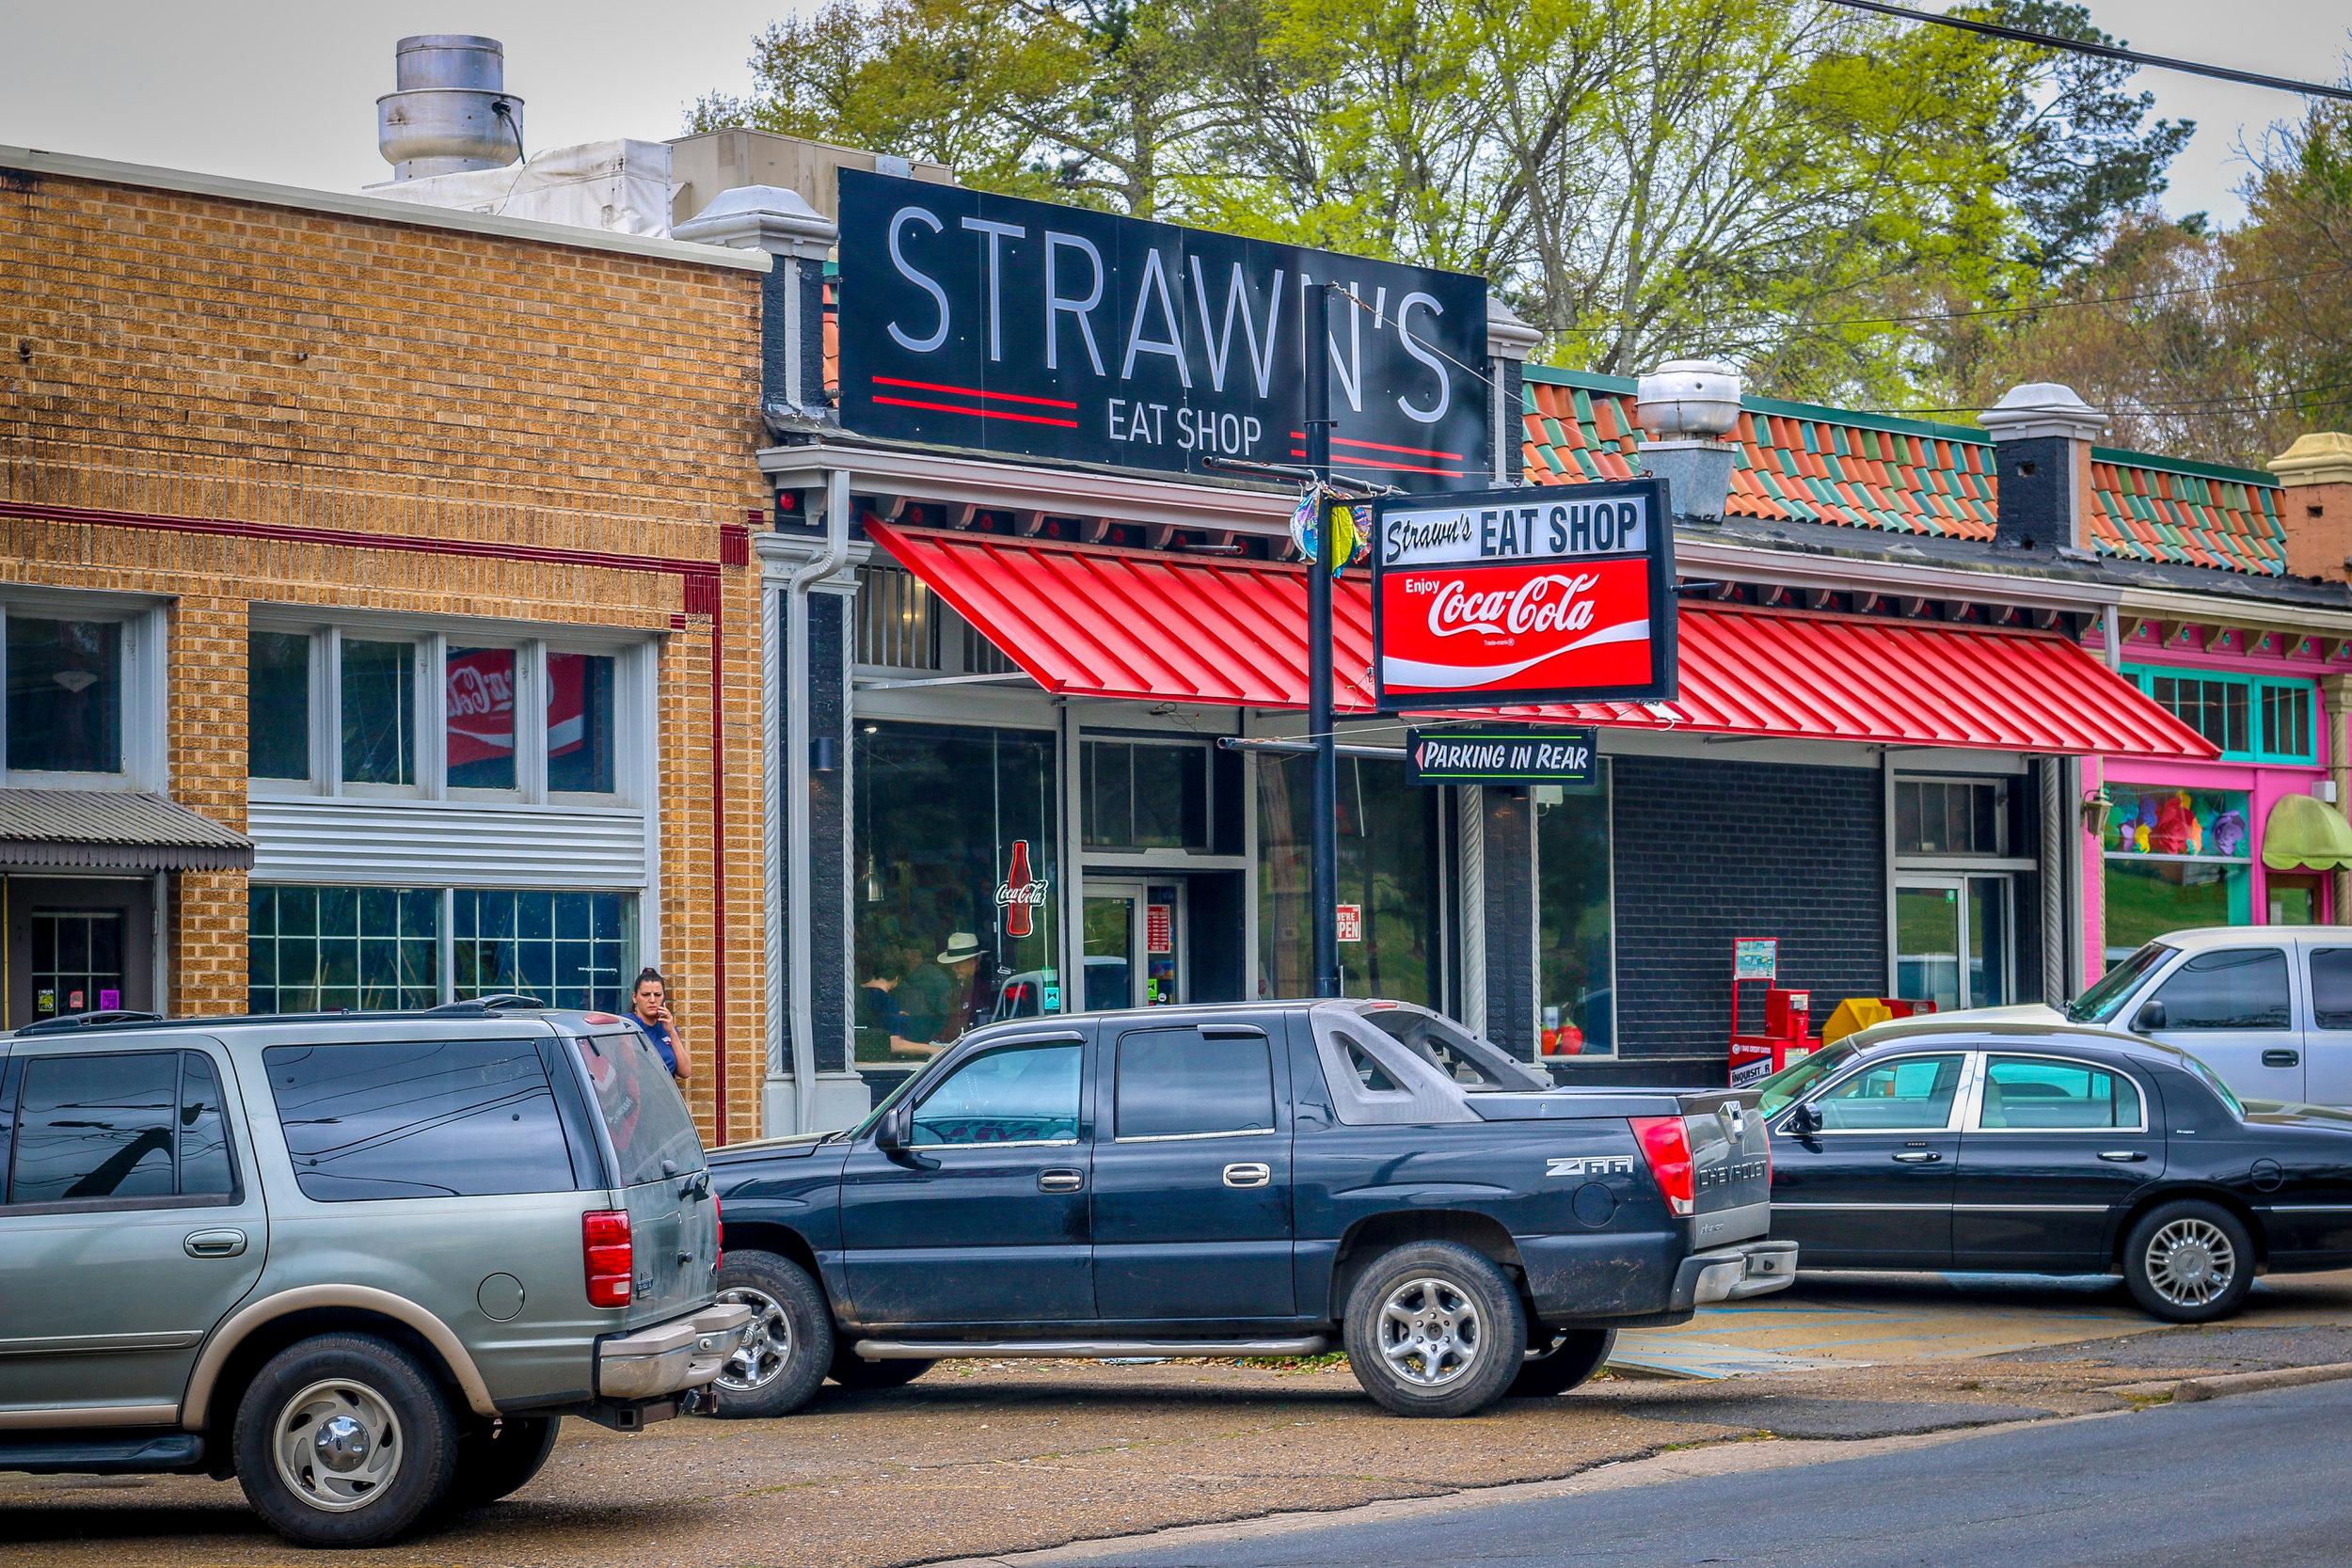 Strawn's Eat Shop